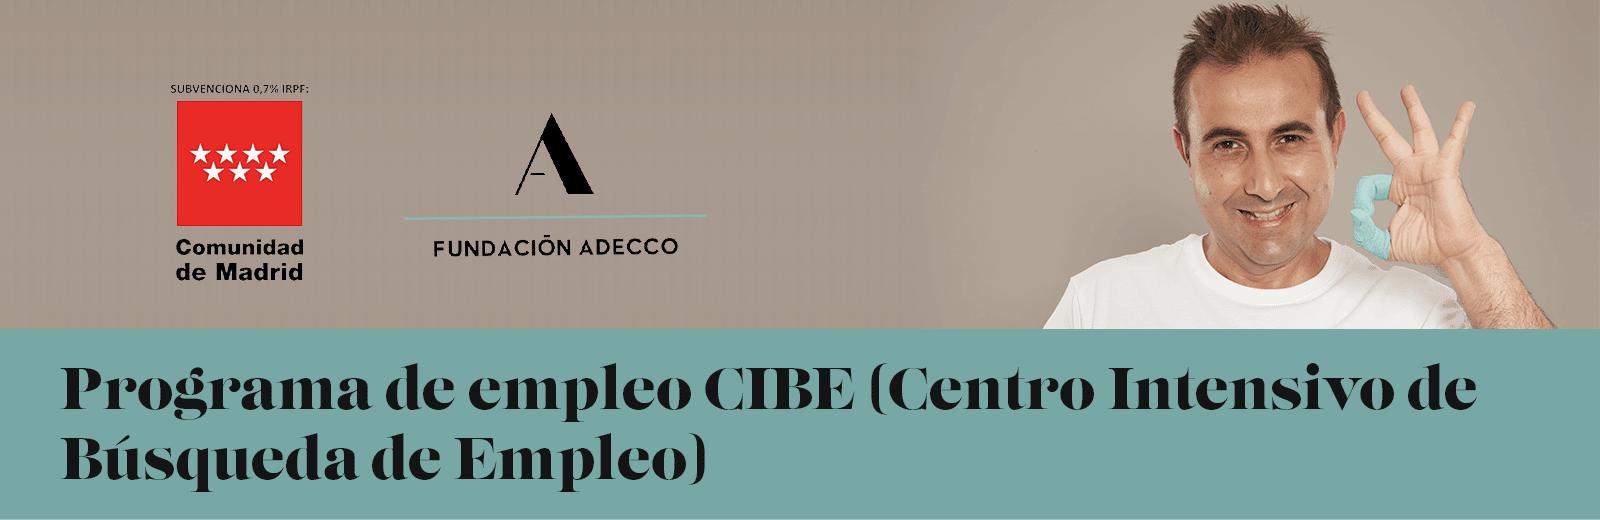 Programa de empleo CIBE